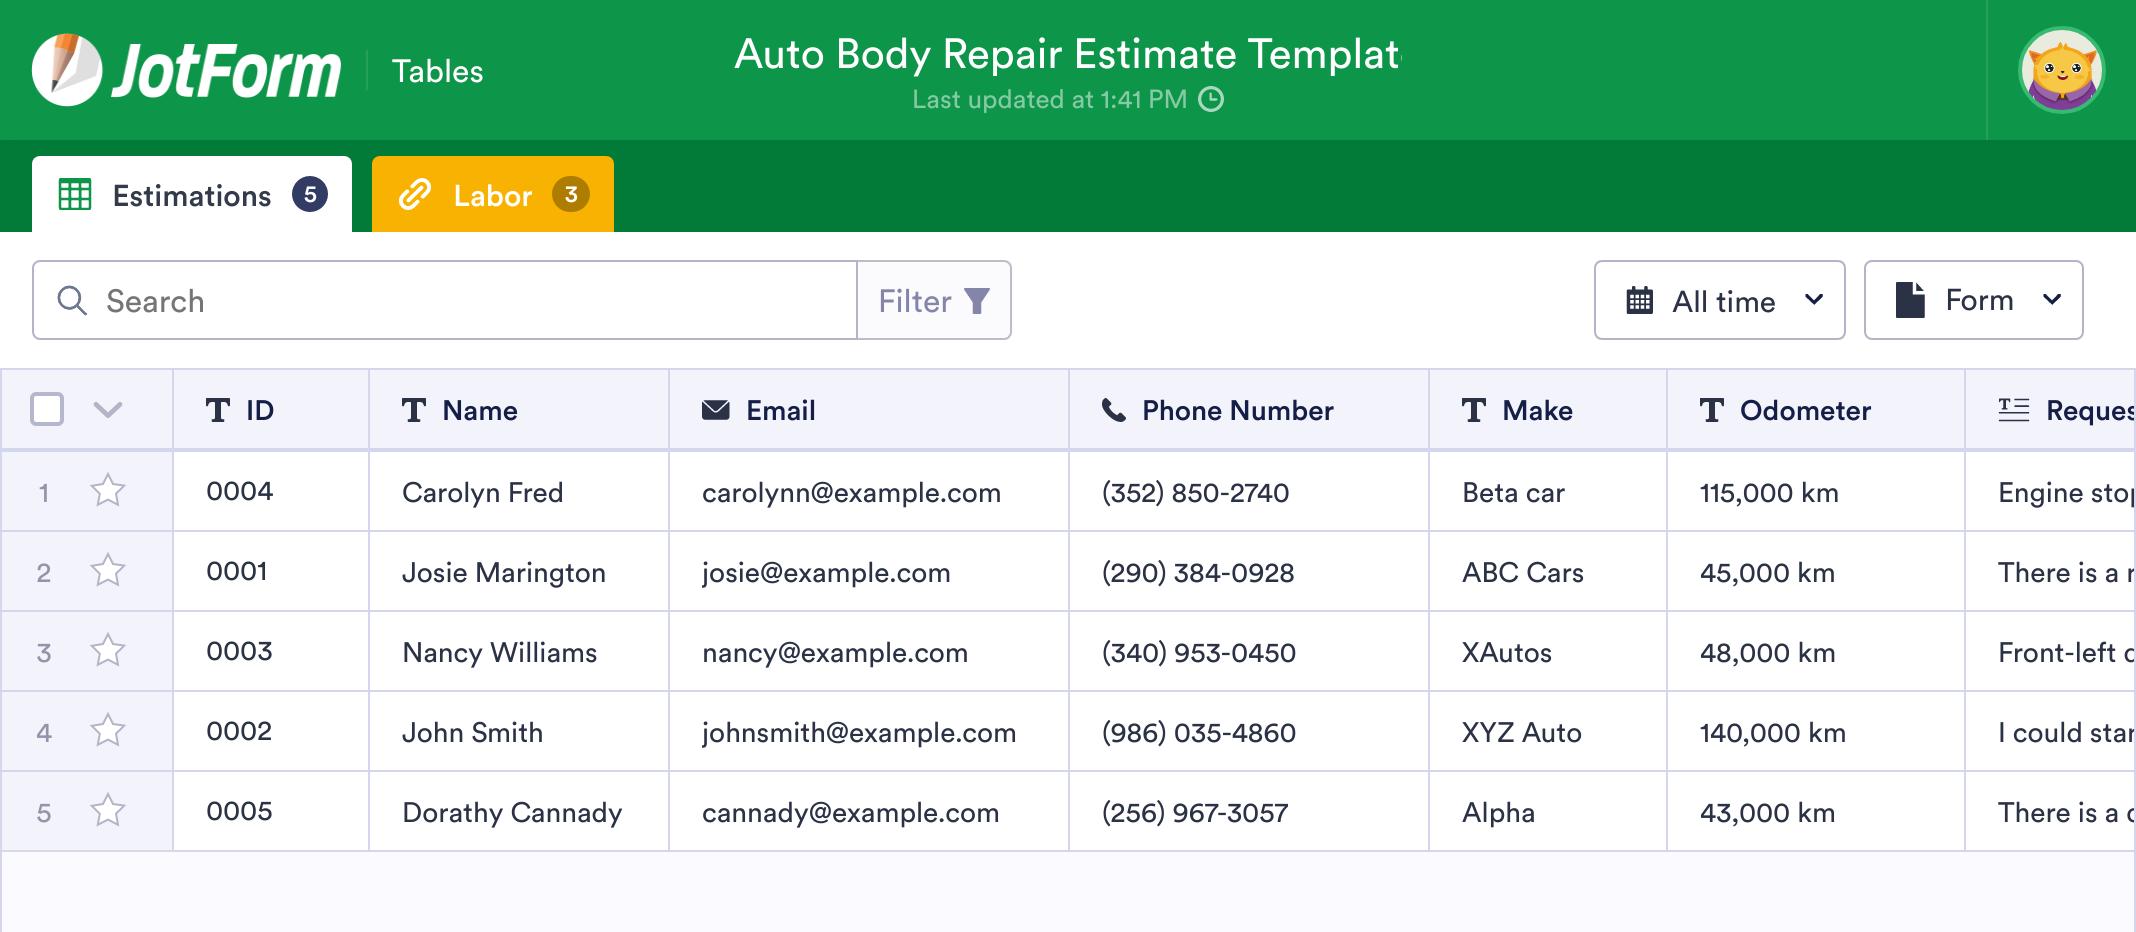 Auto Body Repair Estimate Template